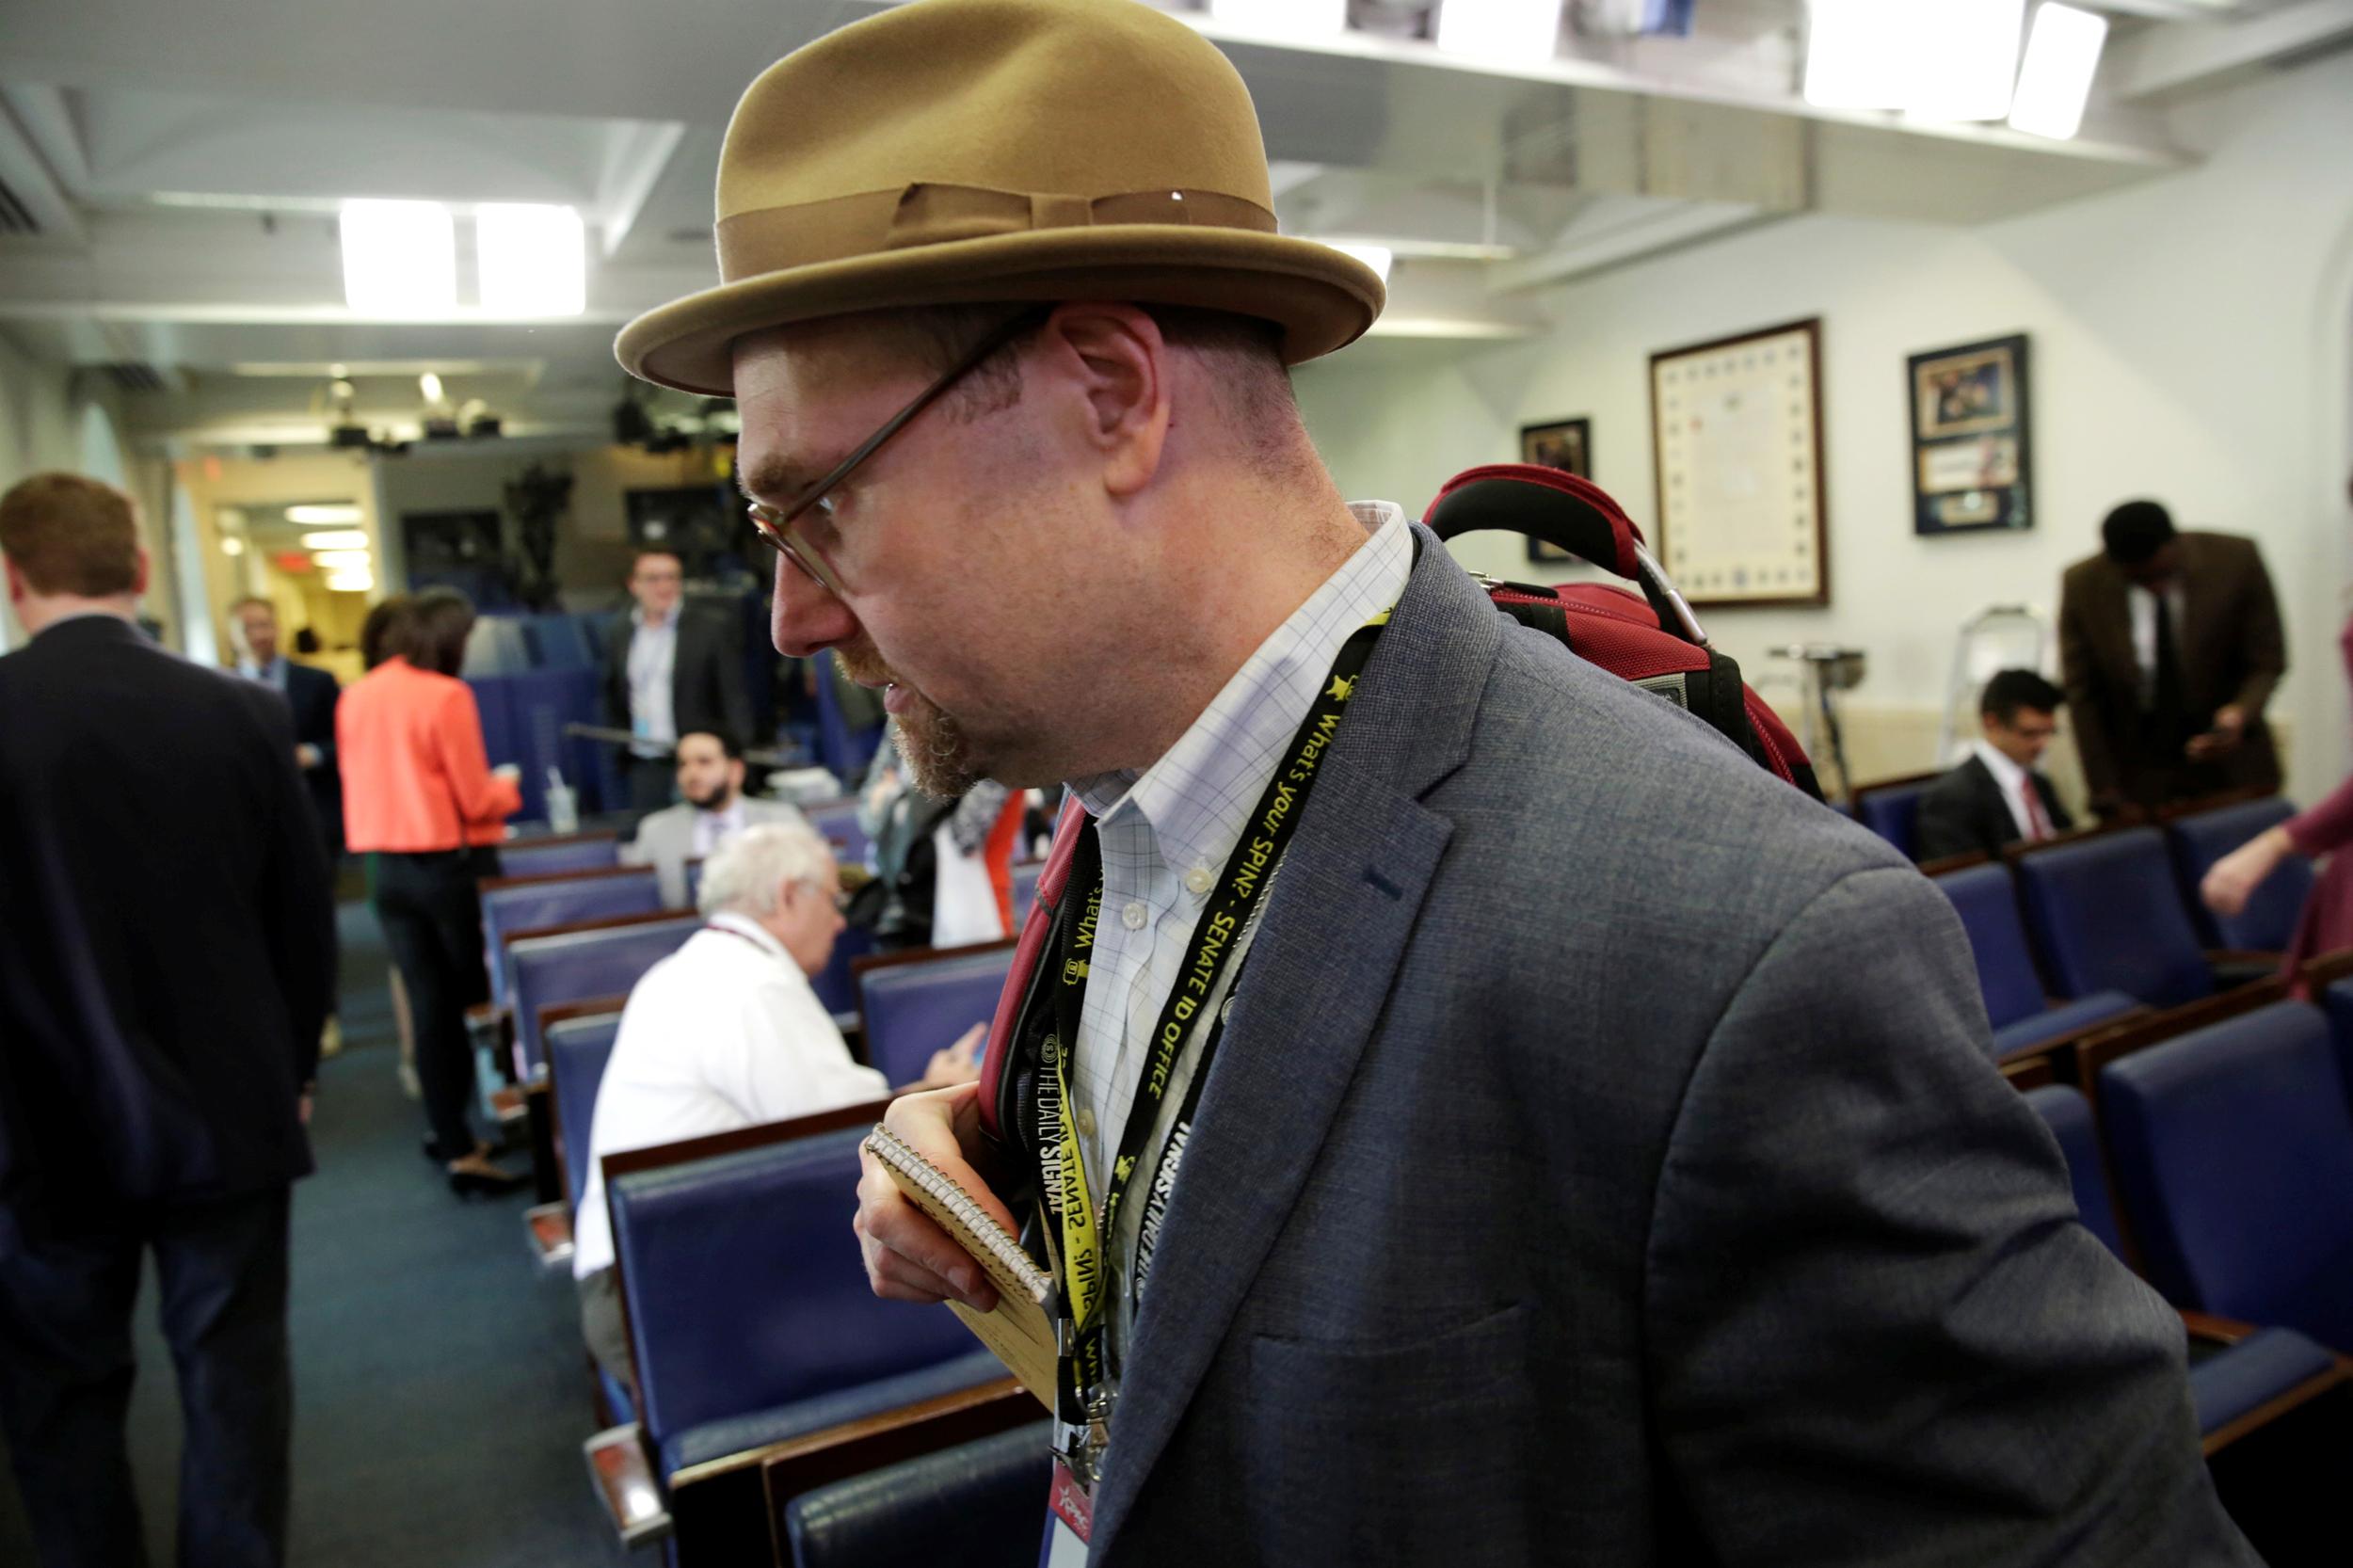 Image: Glenn Thrush, chief White House political correspondent for the The New York Times